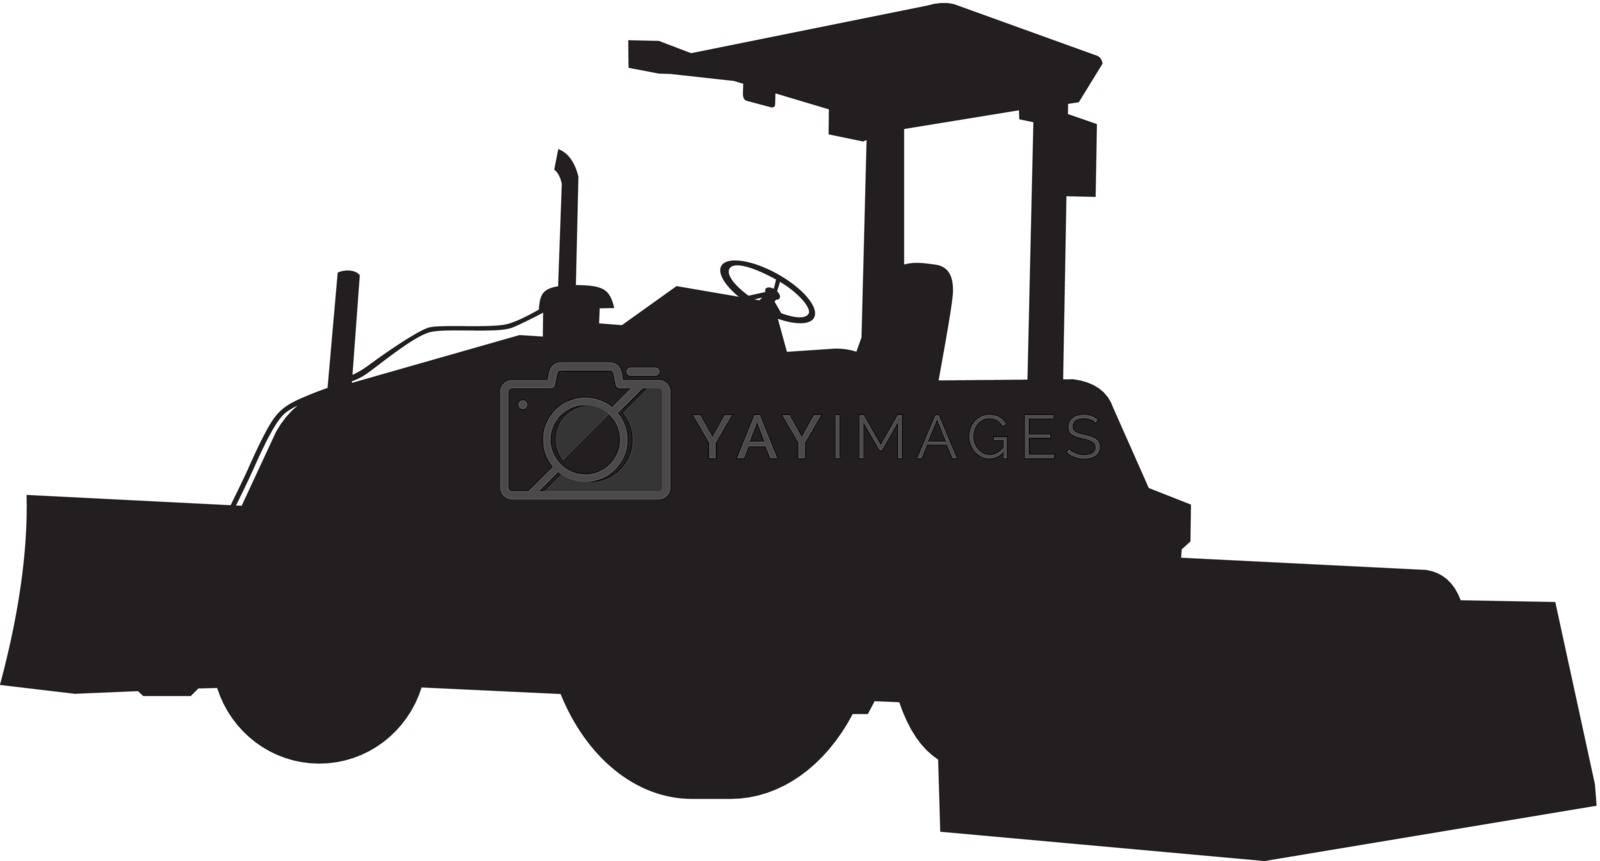 Illustration of bulldozer silhouette